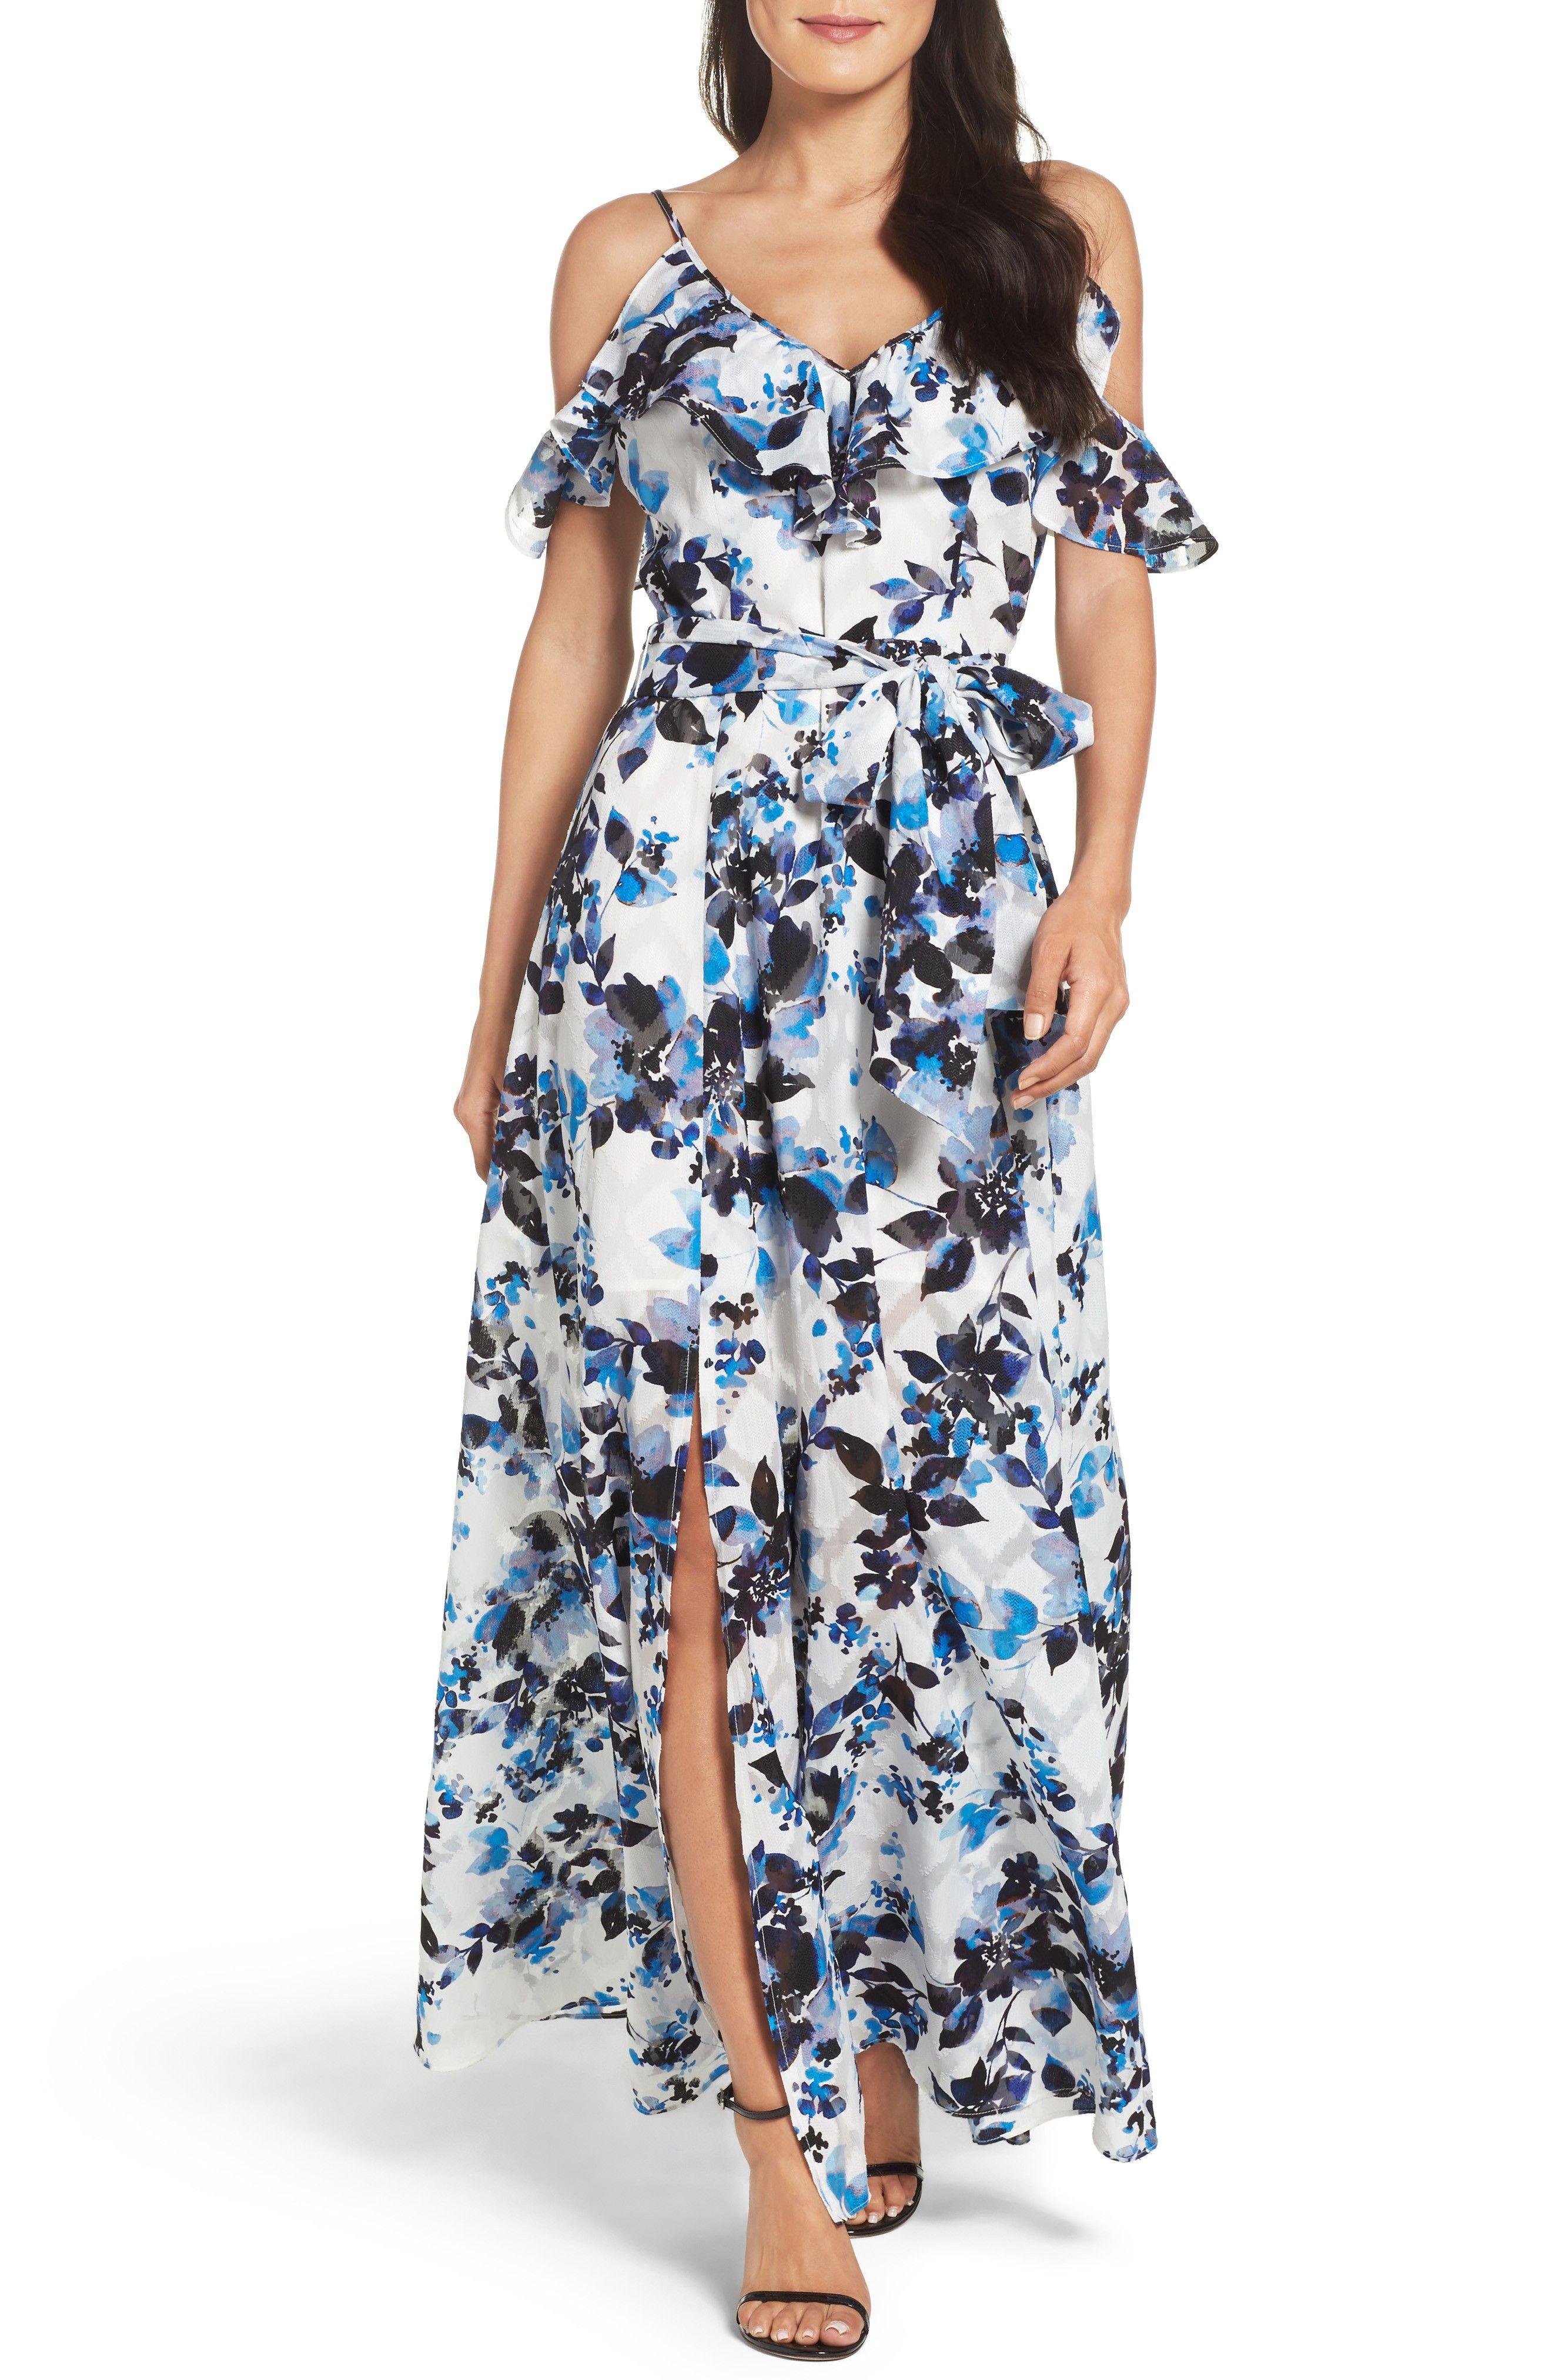 New eliza j cold shoulder maxi dress fashion online shop